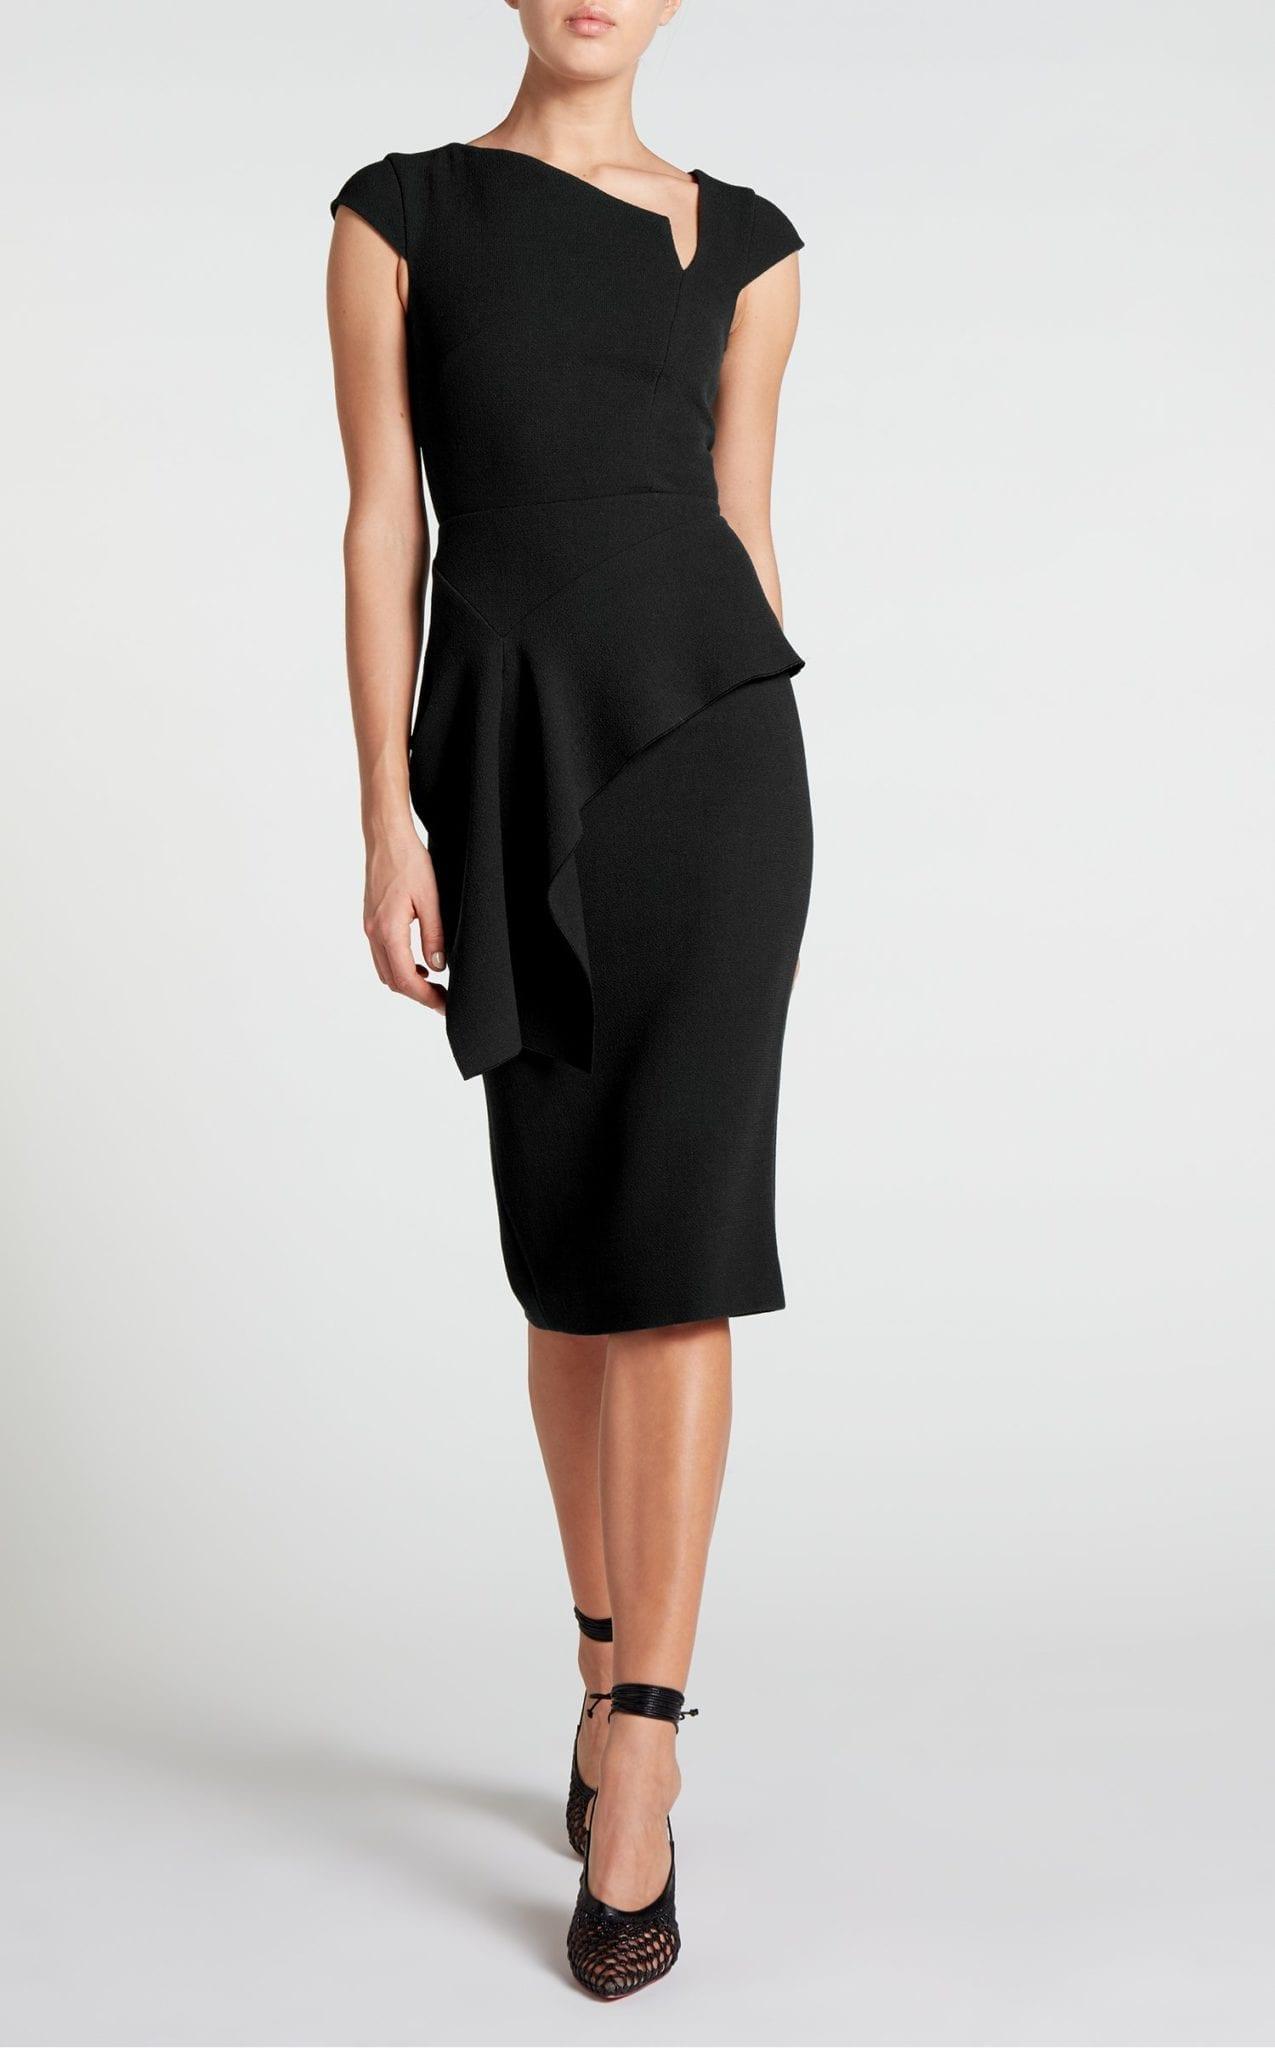 ROLAND MOURET Dandridge Black Dress